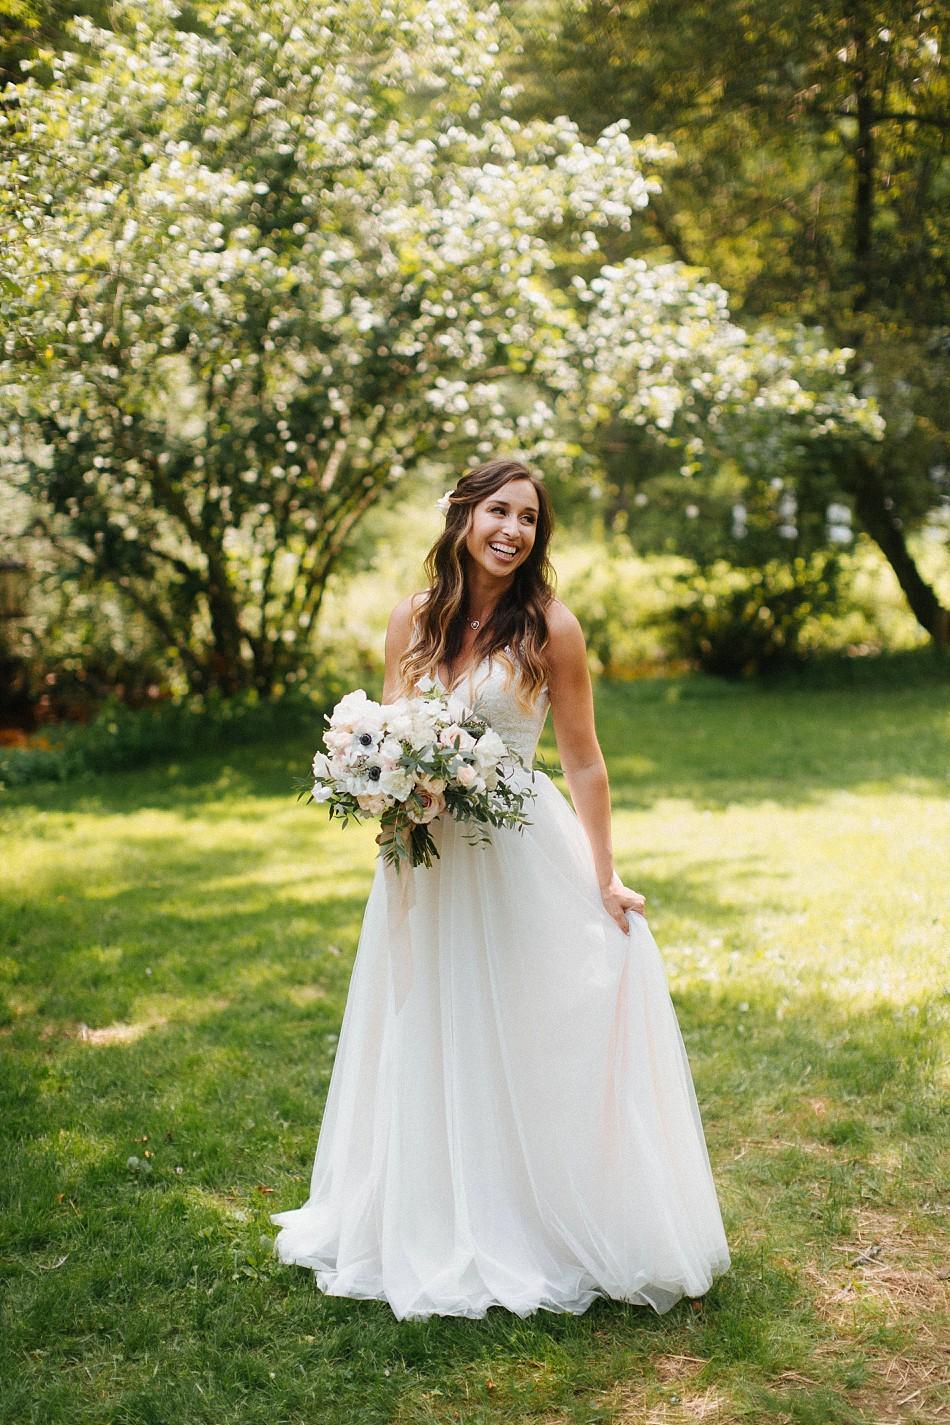 new_hope_pa_wedding_photographers23.jpg